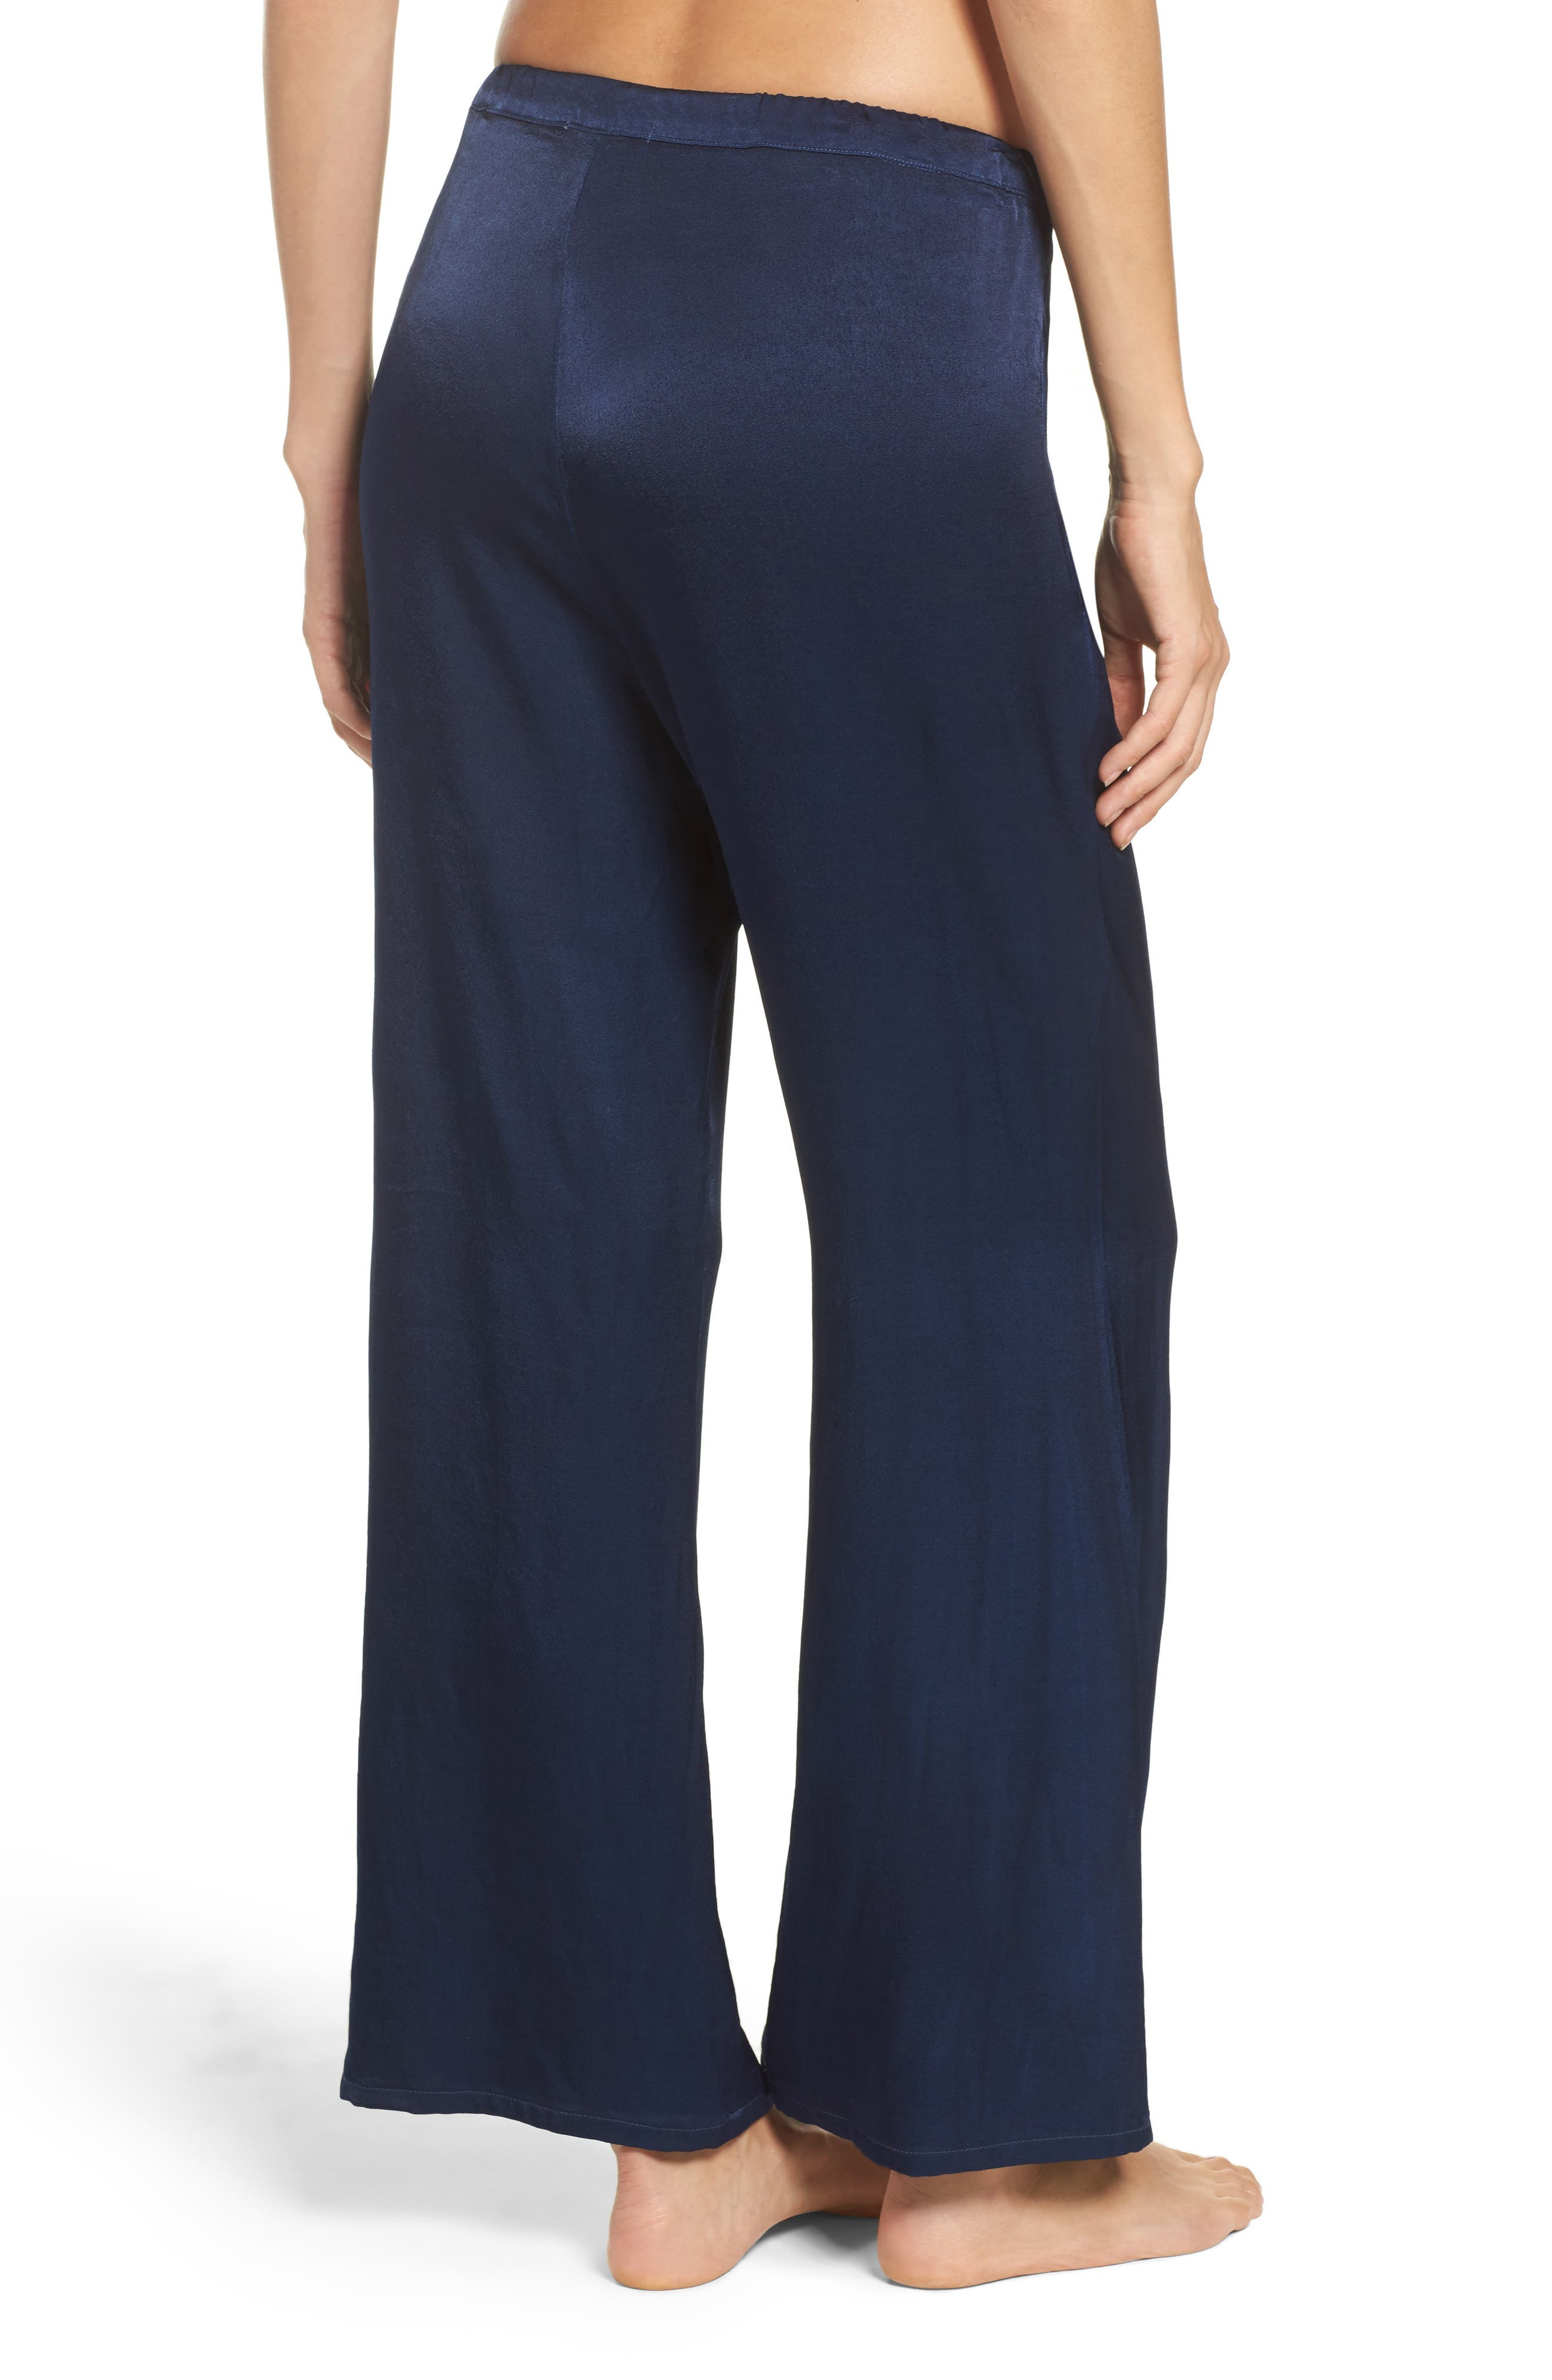 Vela Pajama Pants,                             Alternate thumbnail 2, color,                             Oxford